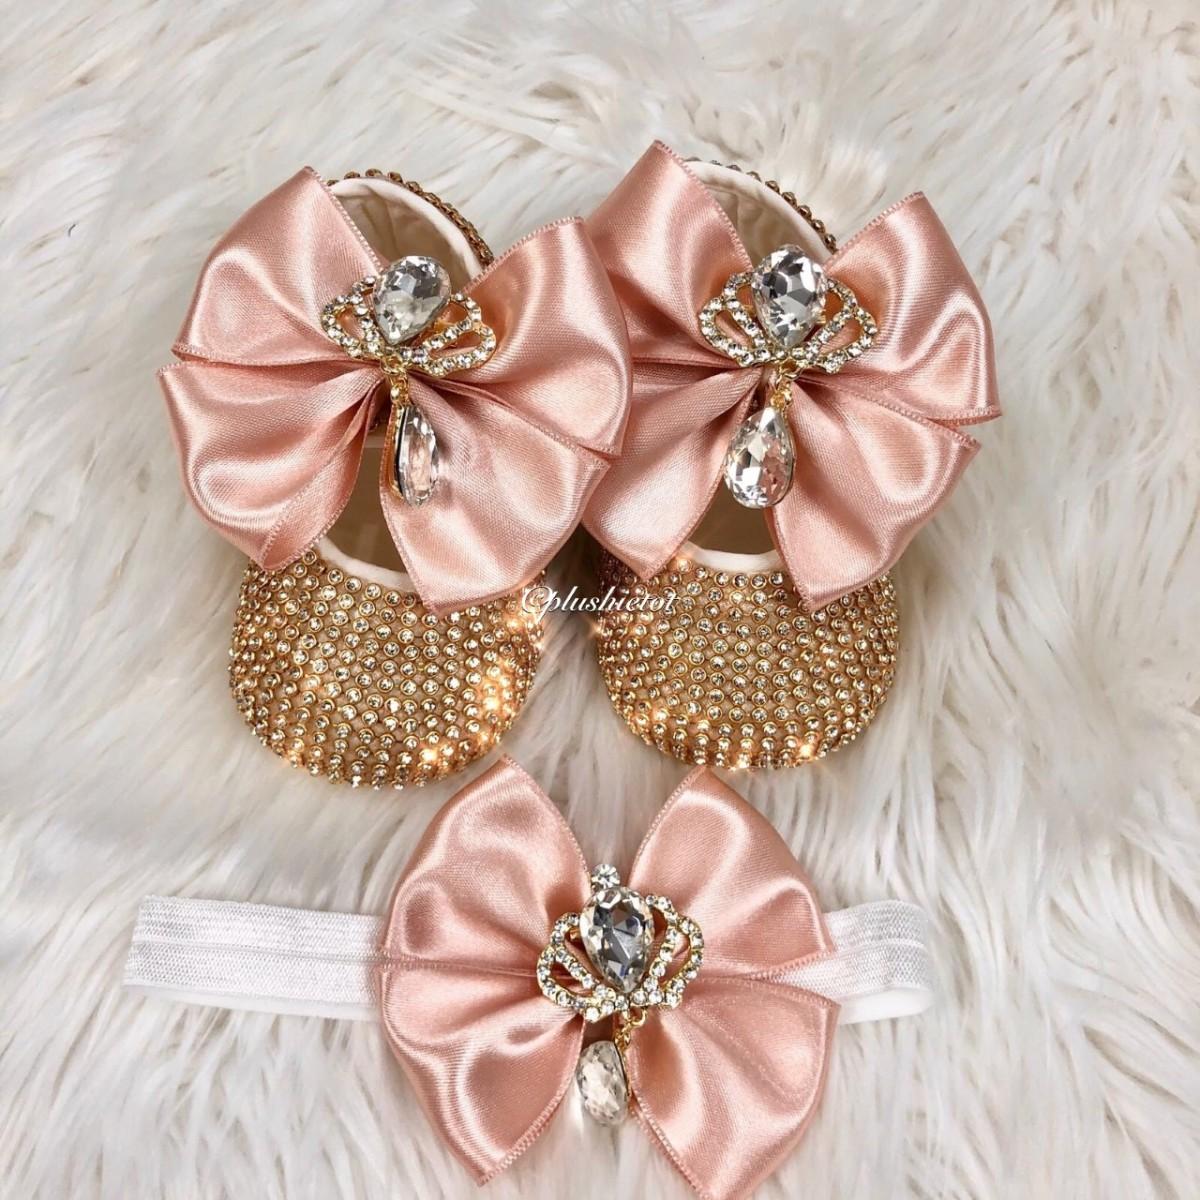 Cinderella Shoes & Headband - Coral Pink & Gold